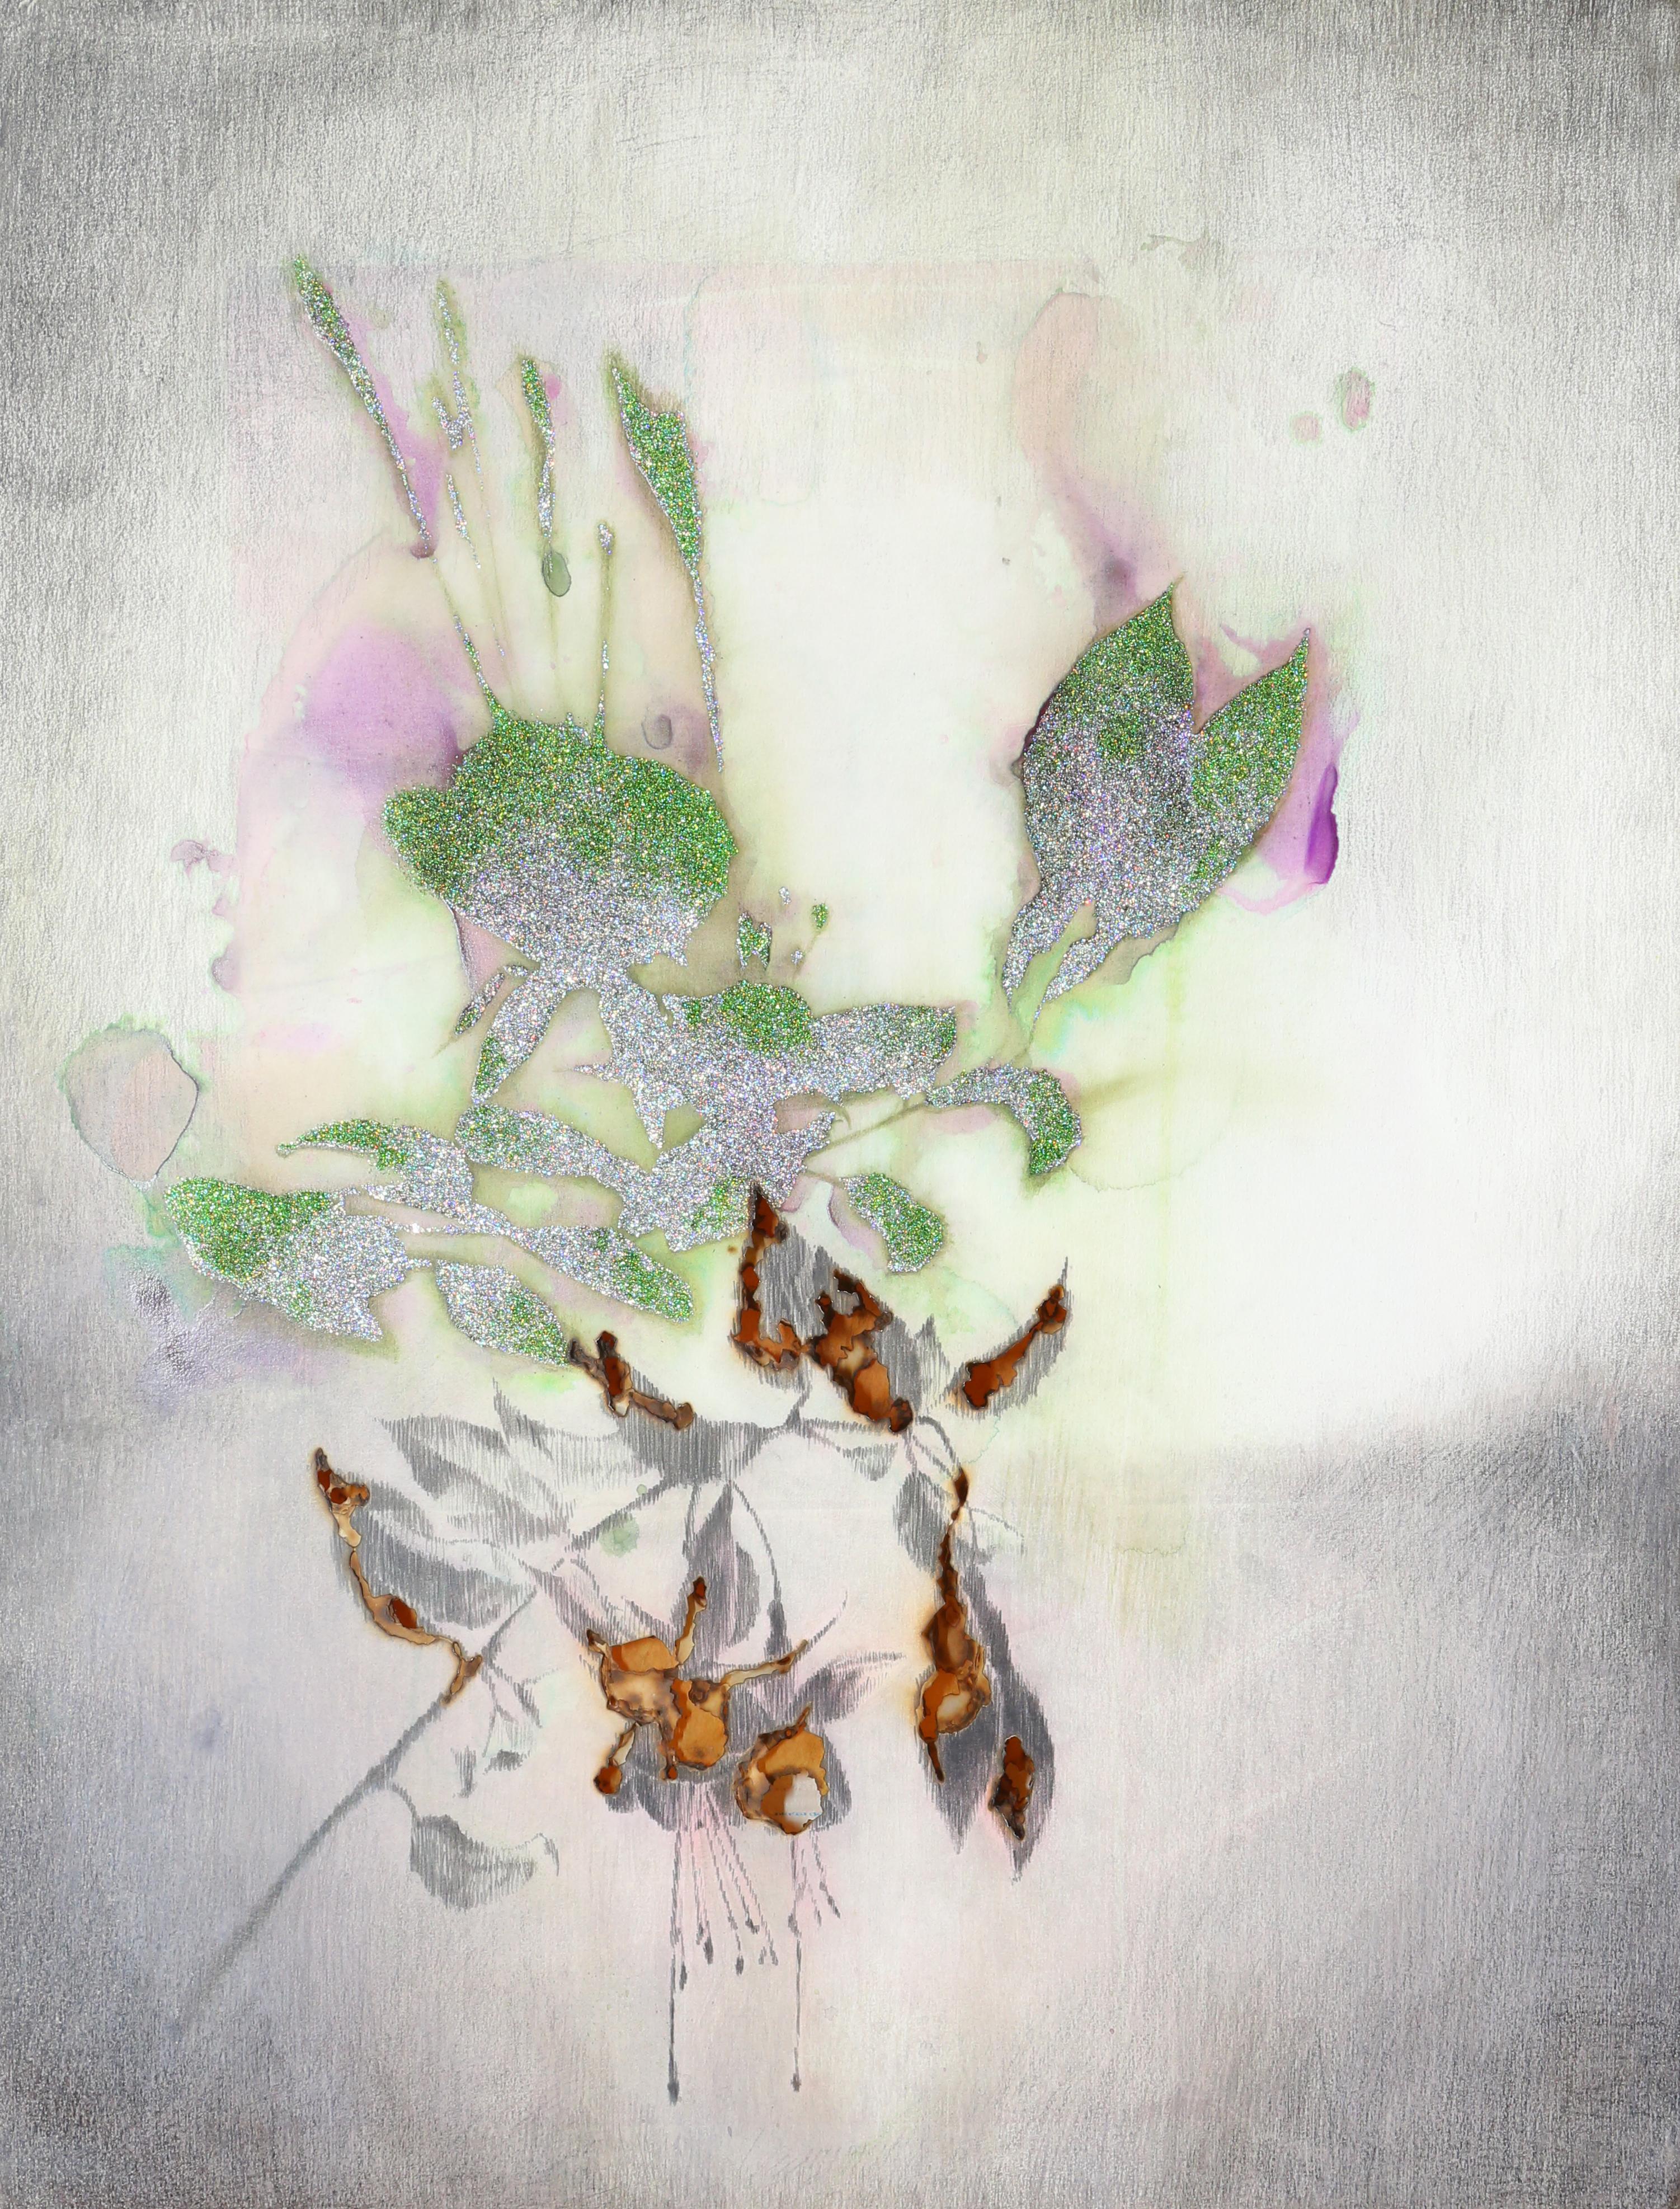 Le portrait des plante,Fuchsia